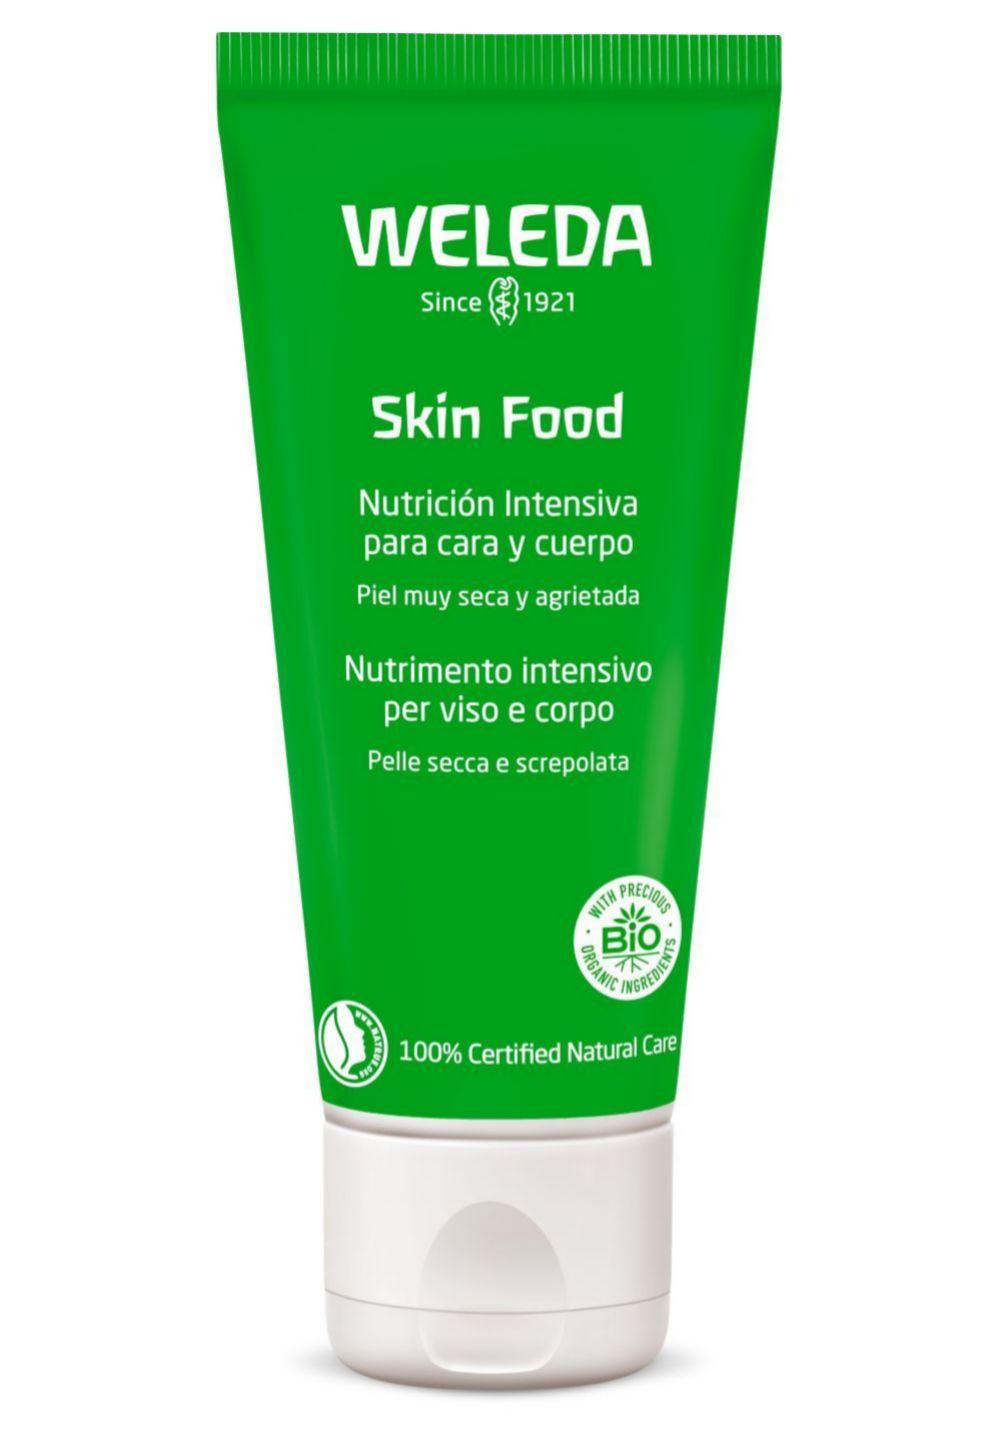 Skin Food Original (30 ml: 9,95 euros y 75 ml: 14,60 euros).